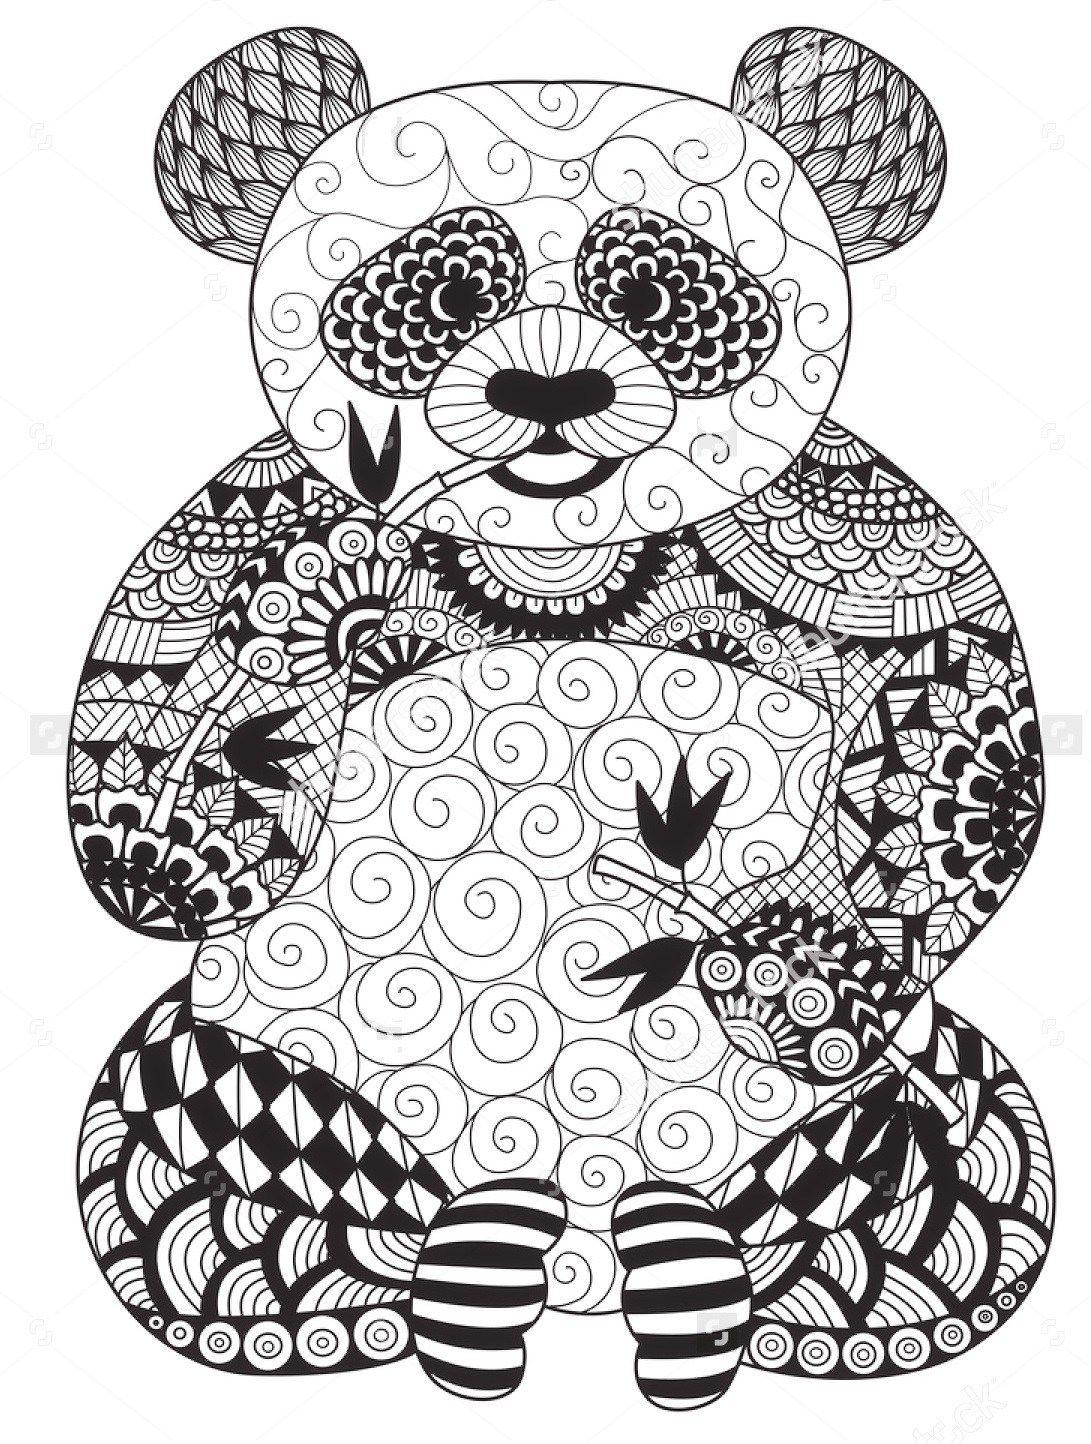 vector-zentangle-panda-coloring-page  Panda coloring pages